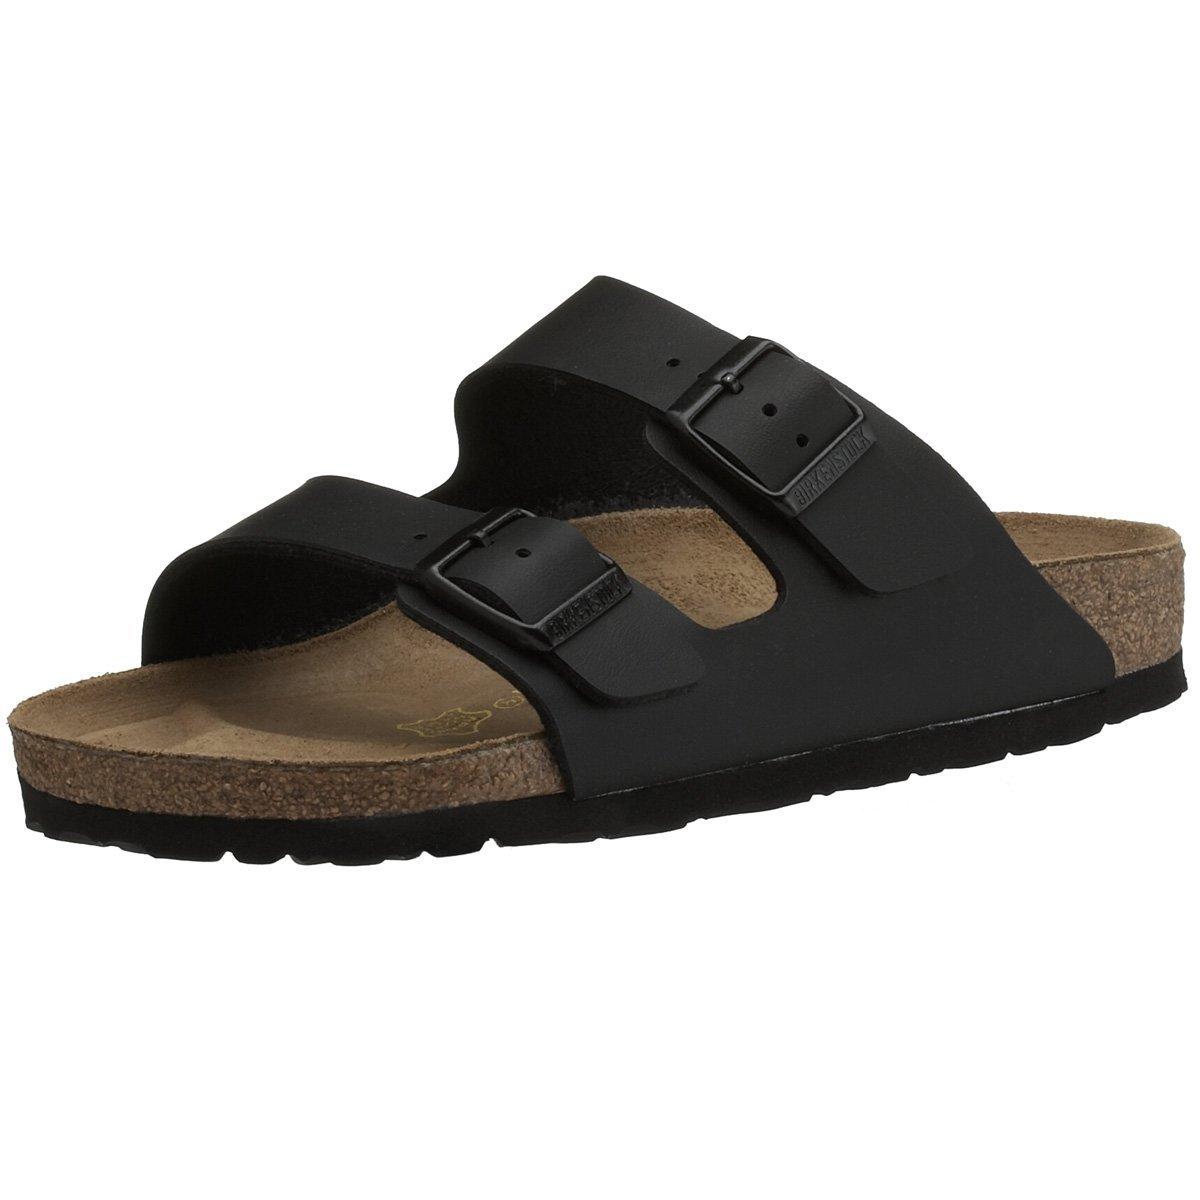 Birkenstock Sandals ''Arizona'' from Leather in Black 40.0 EU W